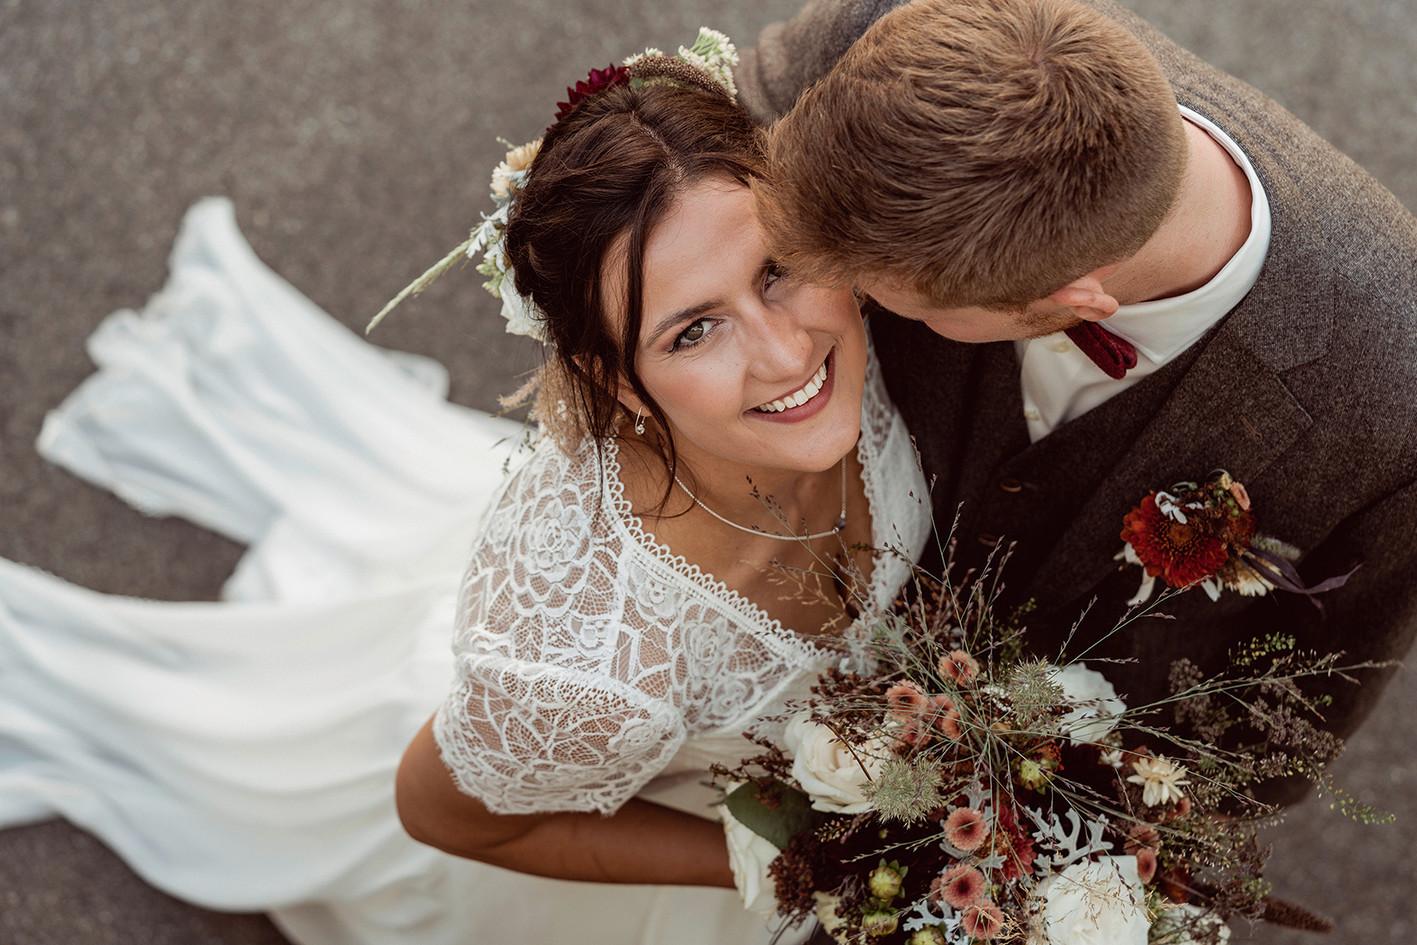 080-married-united-wedding-suephotoart-p